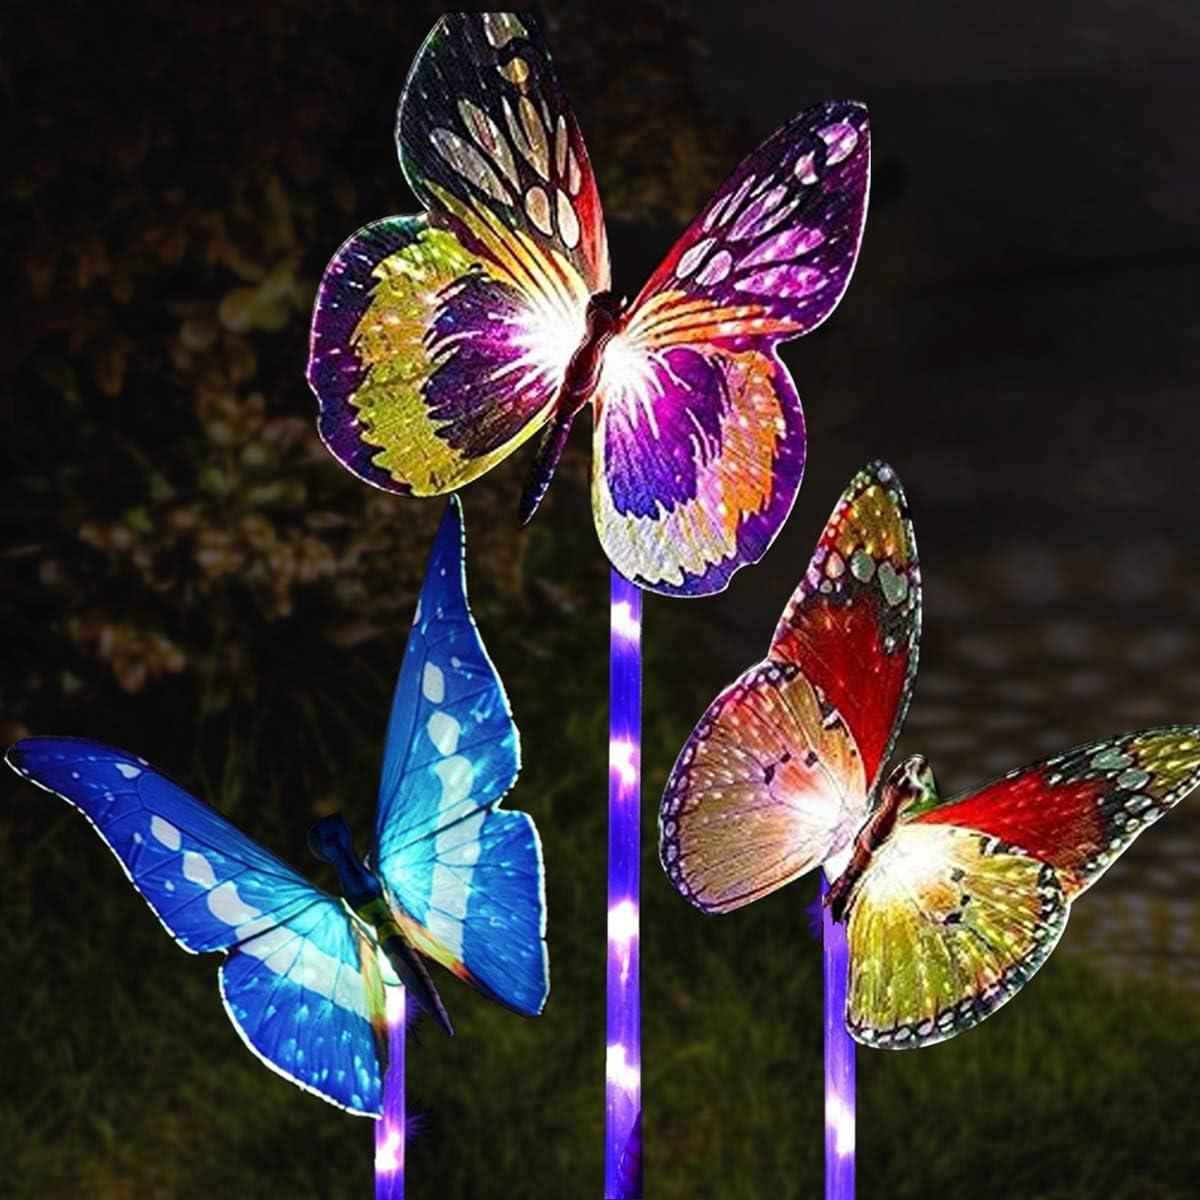 Garden Solar Lights Outdoor, Multi-Color Changing Solar Powered LED Garden Lights, Waterproof Light Sensor Solar Butterfly Lights, Outdoor Decor, Yard Art, Garden Decorations.(3-Pack)